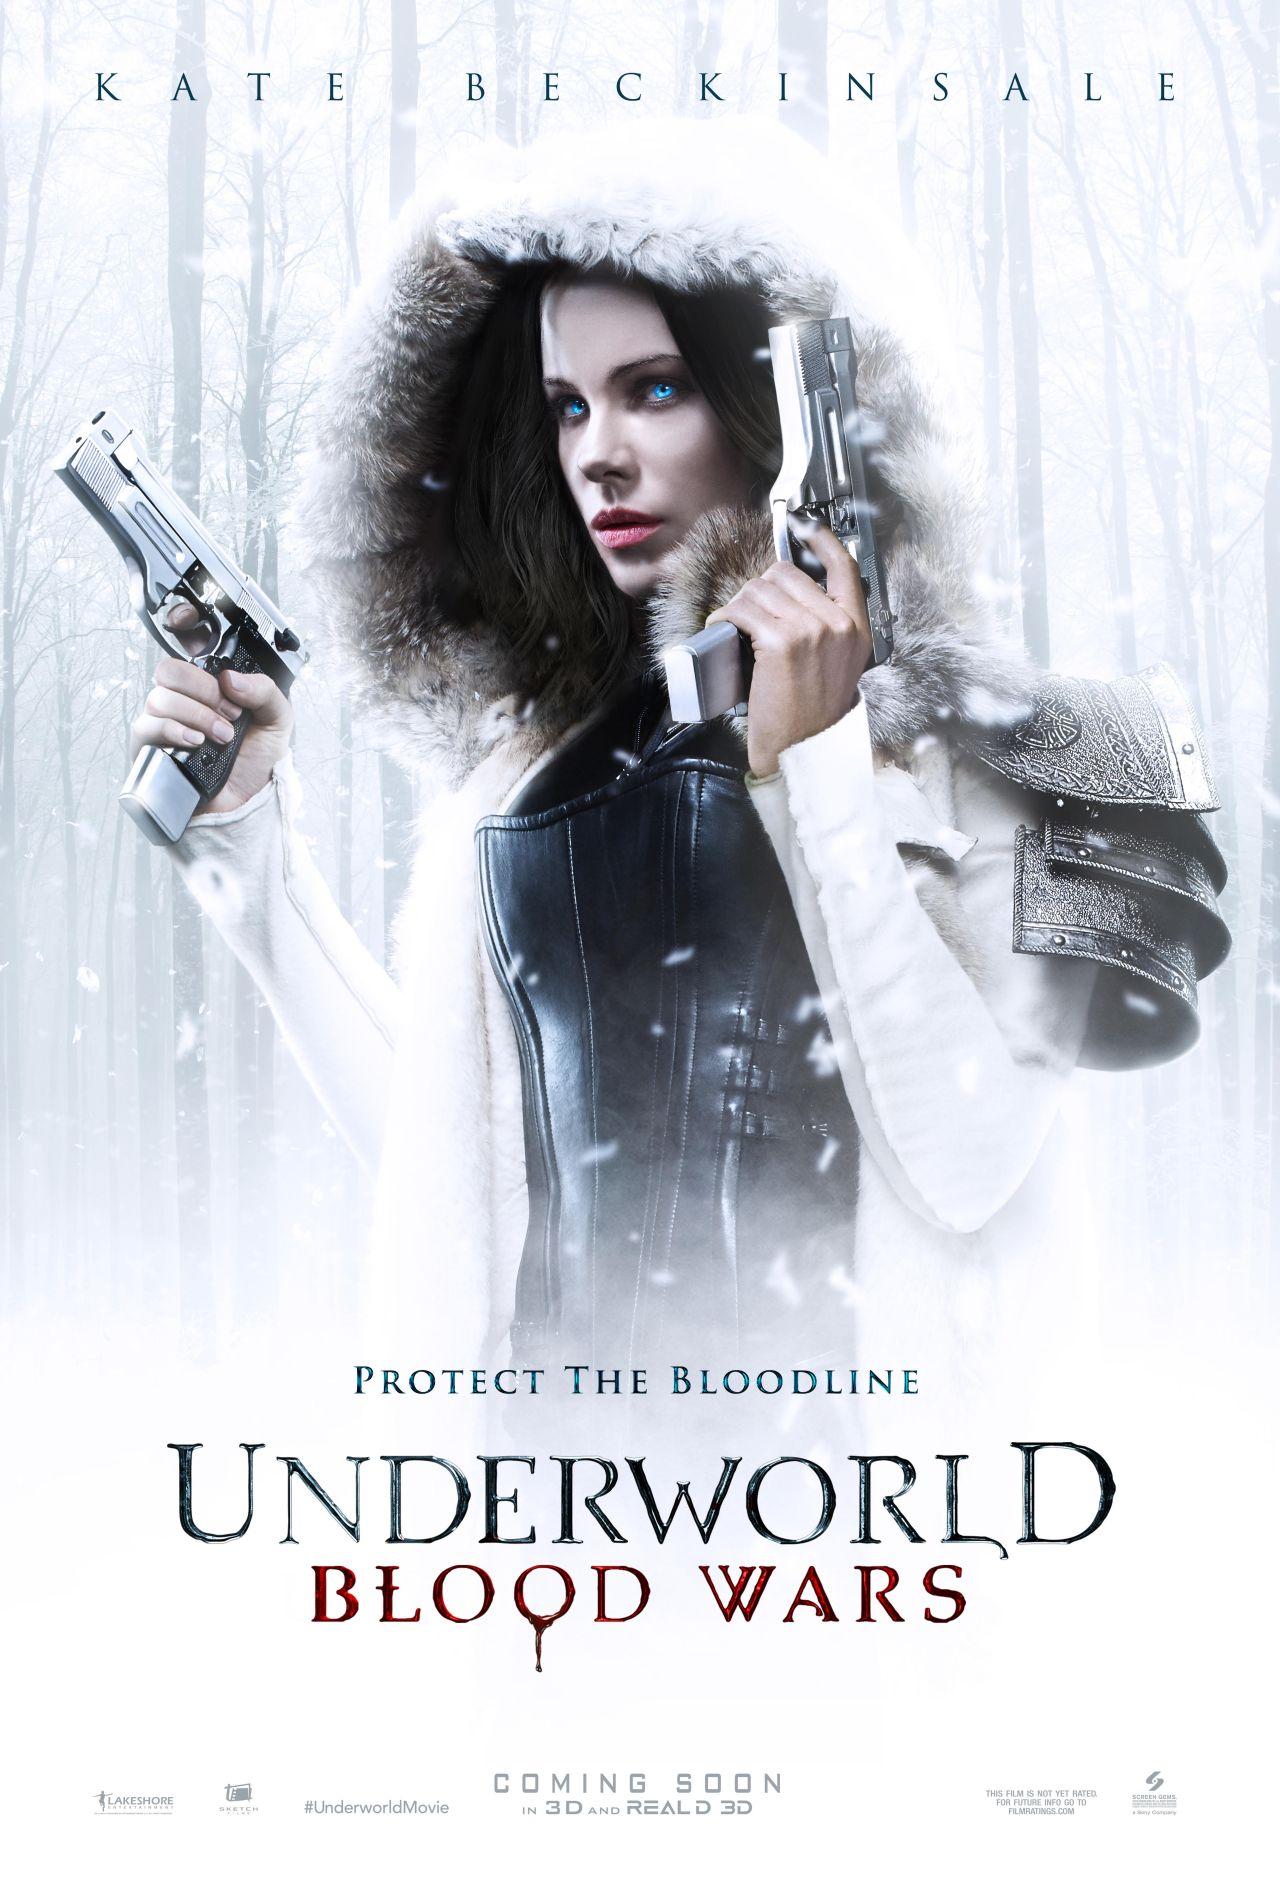 szmk_underworld_blood_wars_verozon_7.jpg